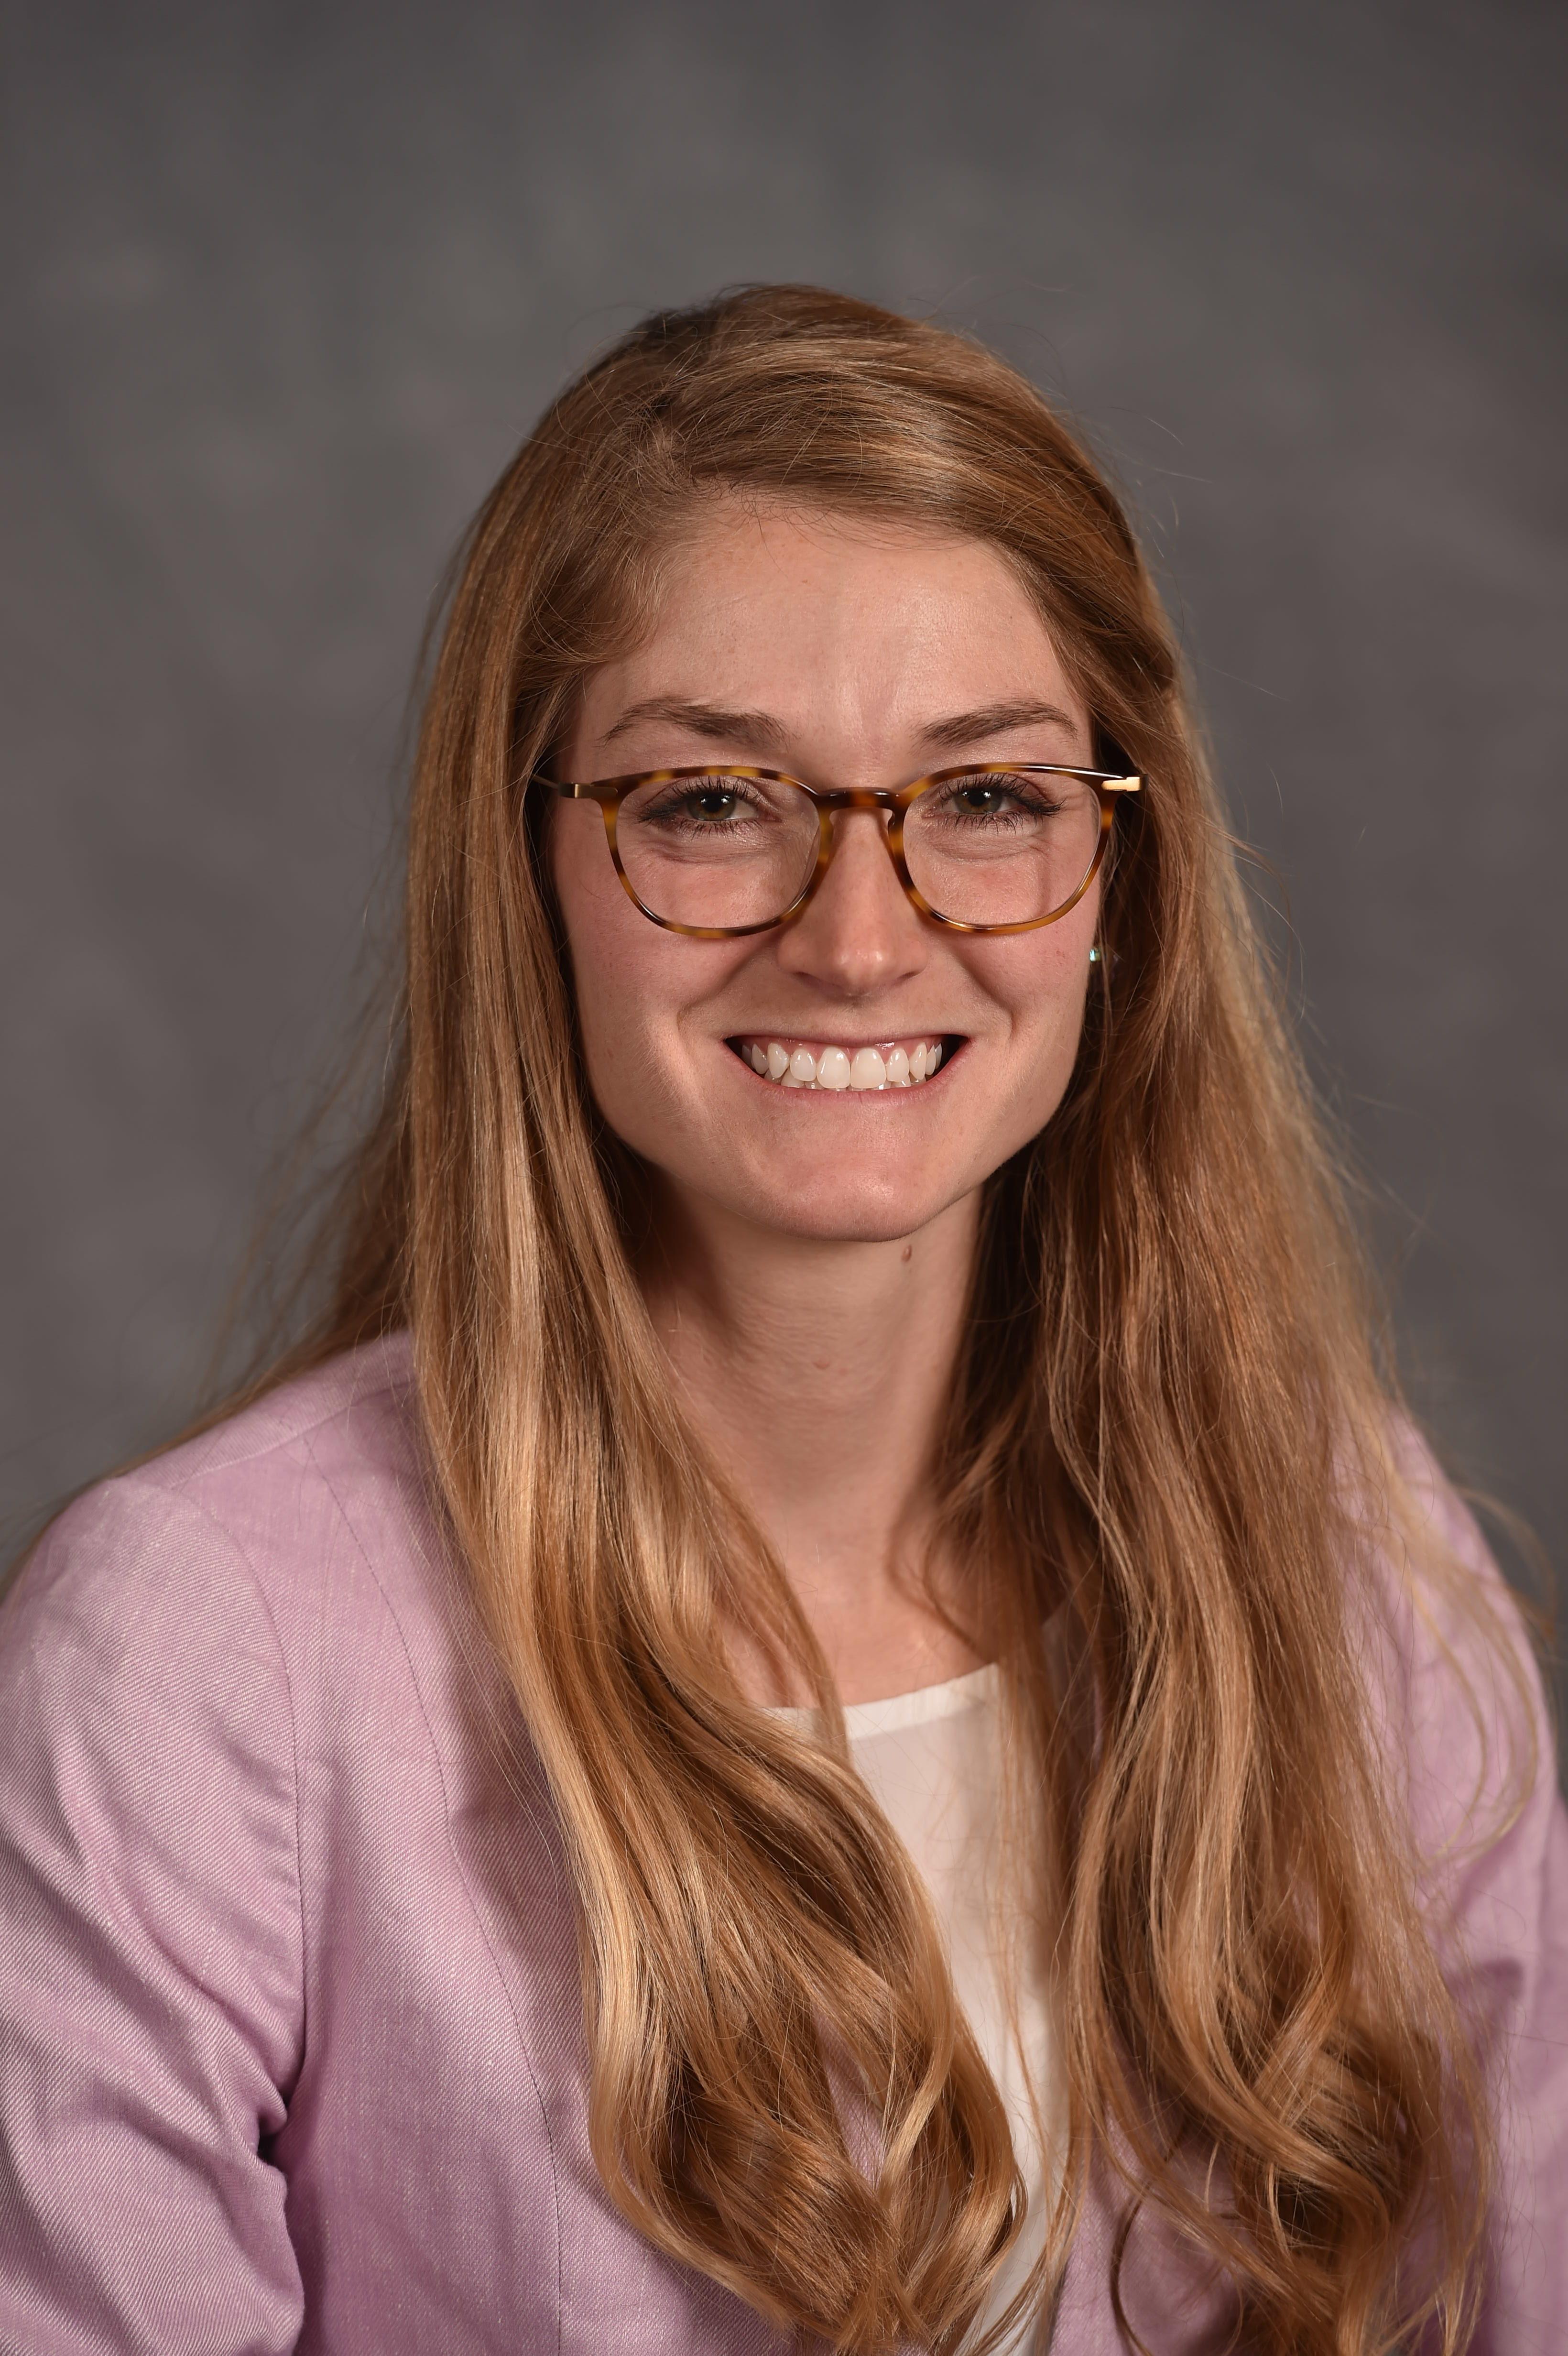 IMPACT PhD Student Erica Doering